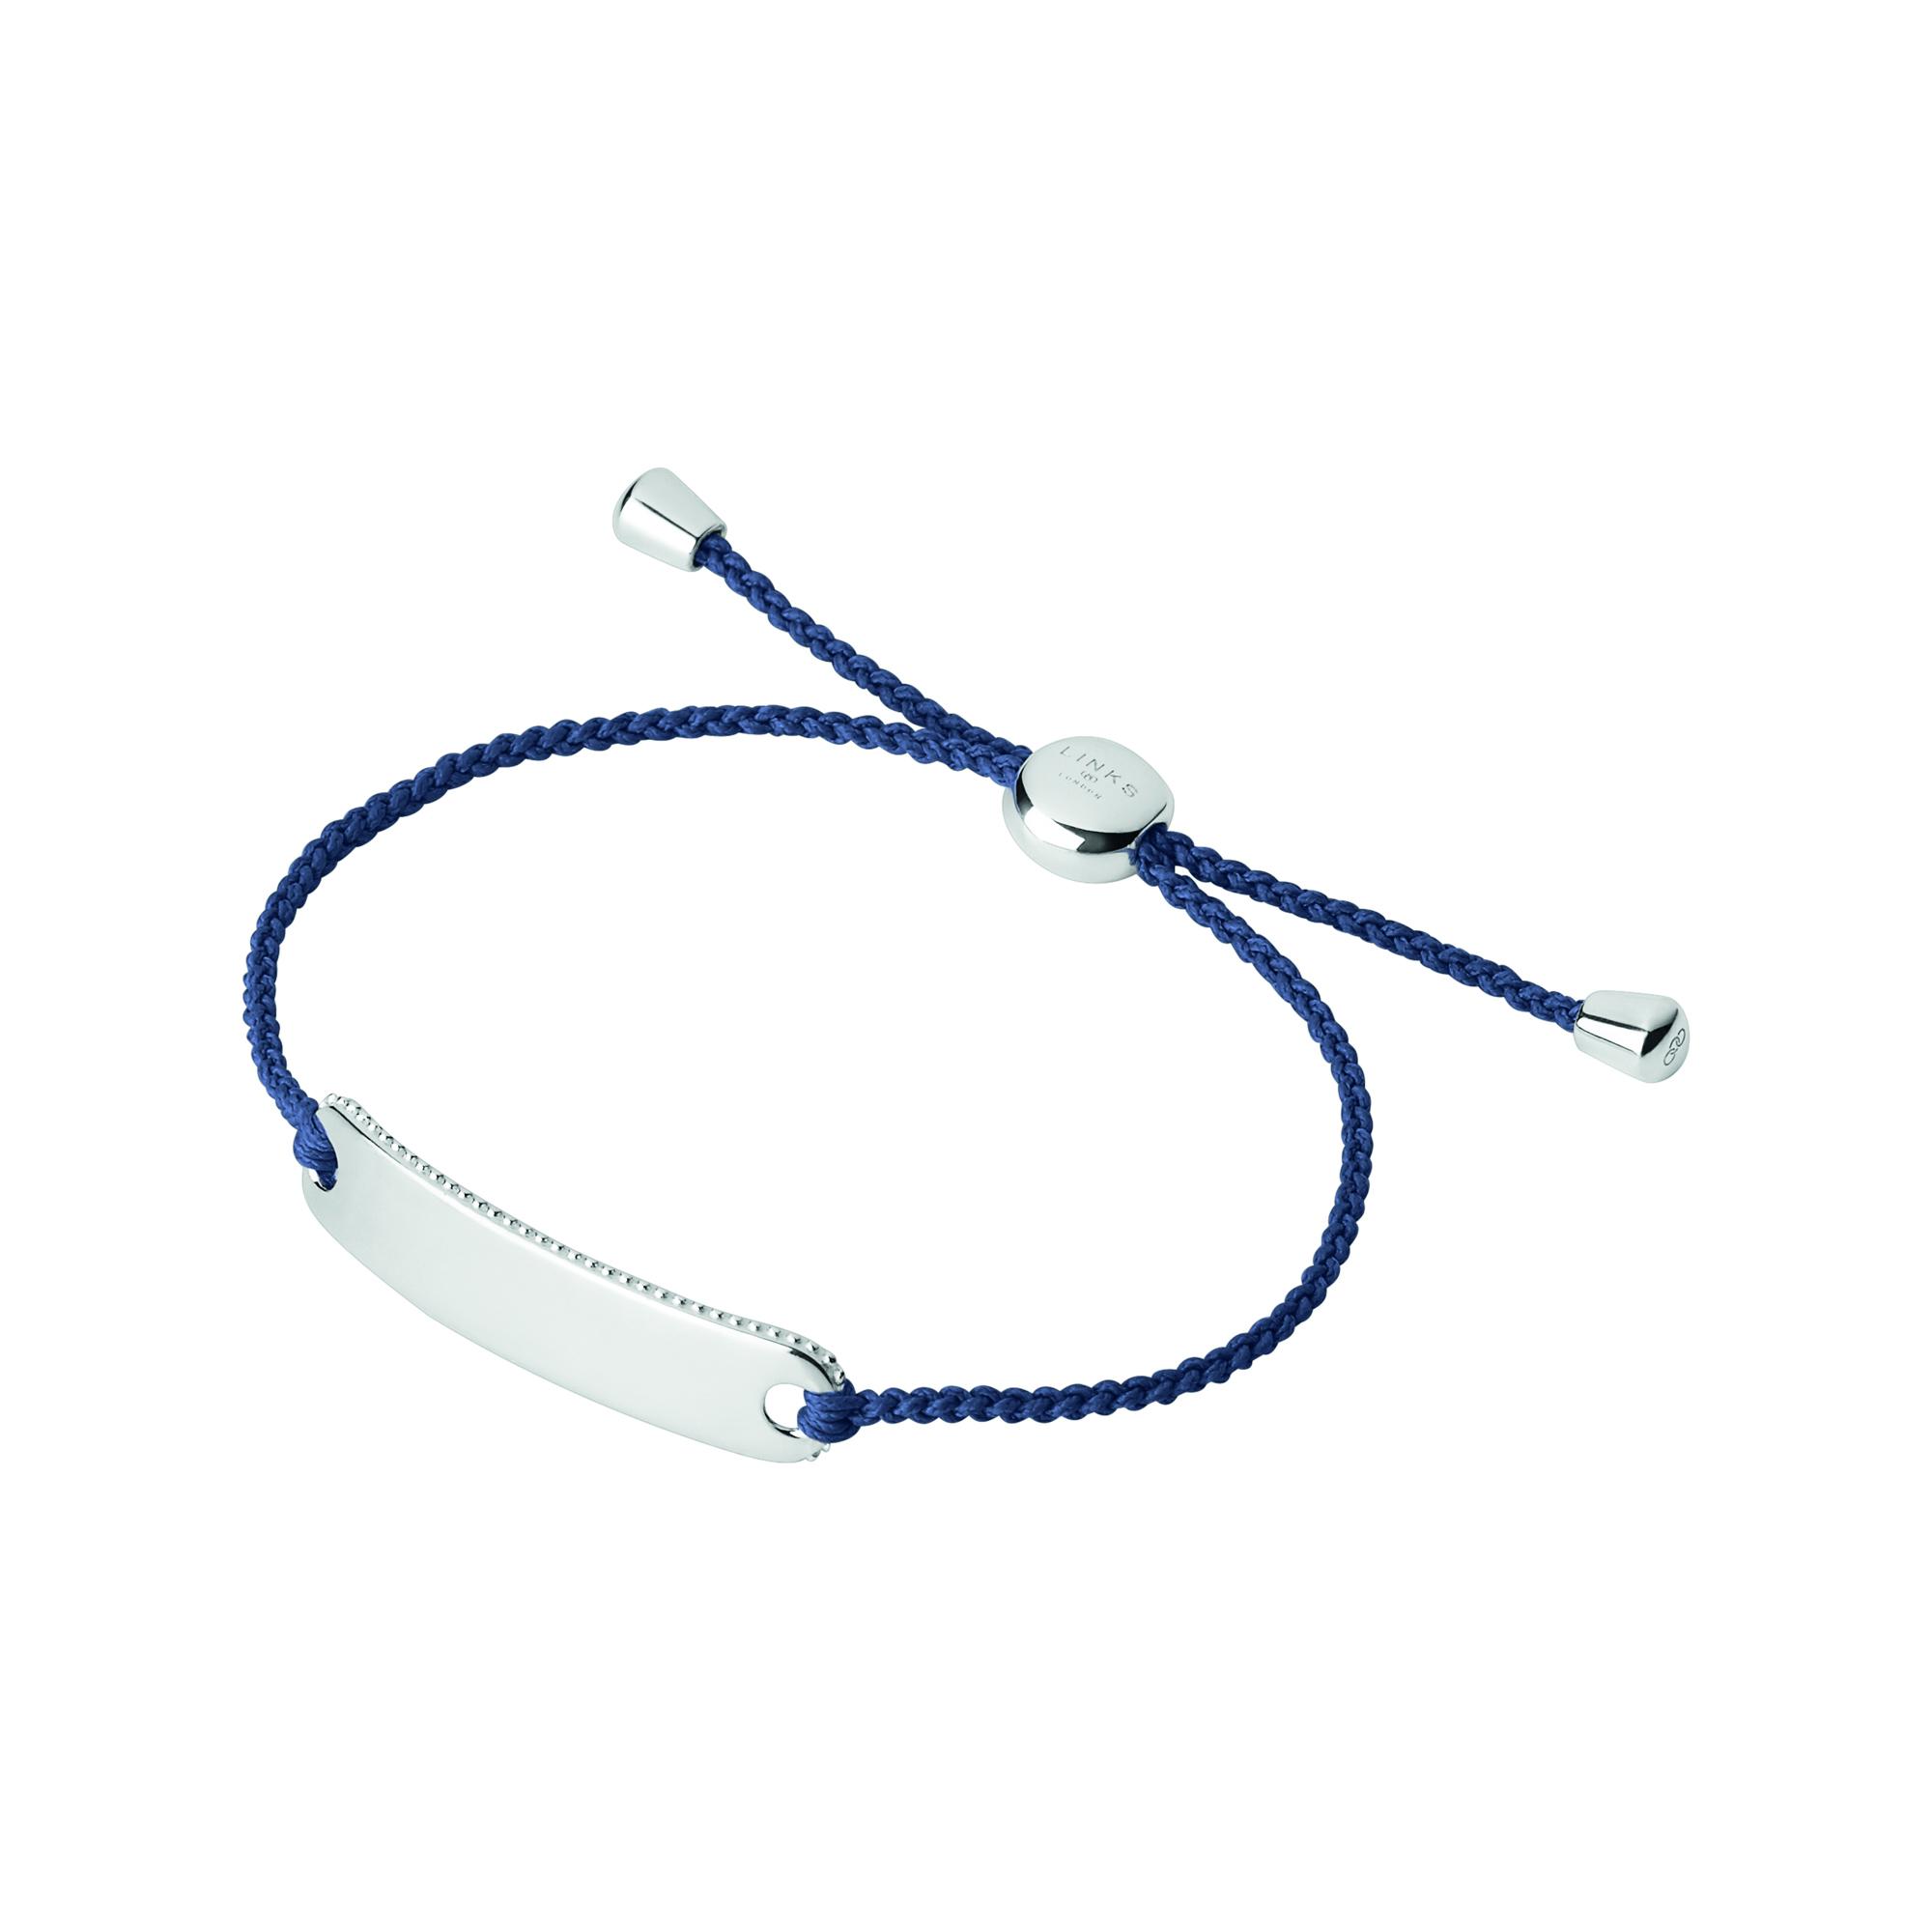 LINKS OF LONDON - Ασημένιο βραχιόλι Outlet Amulet μπλε γυναικεία αξεσουάρ κοσμήματα βραχιόλια